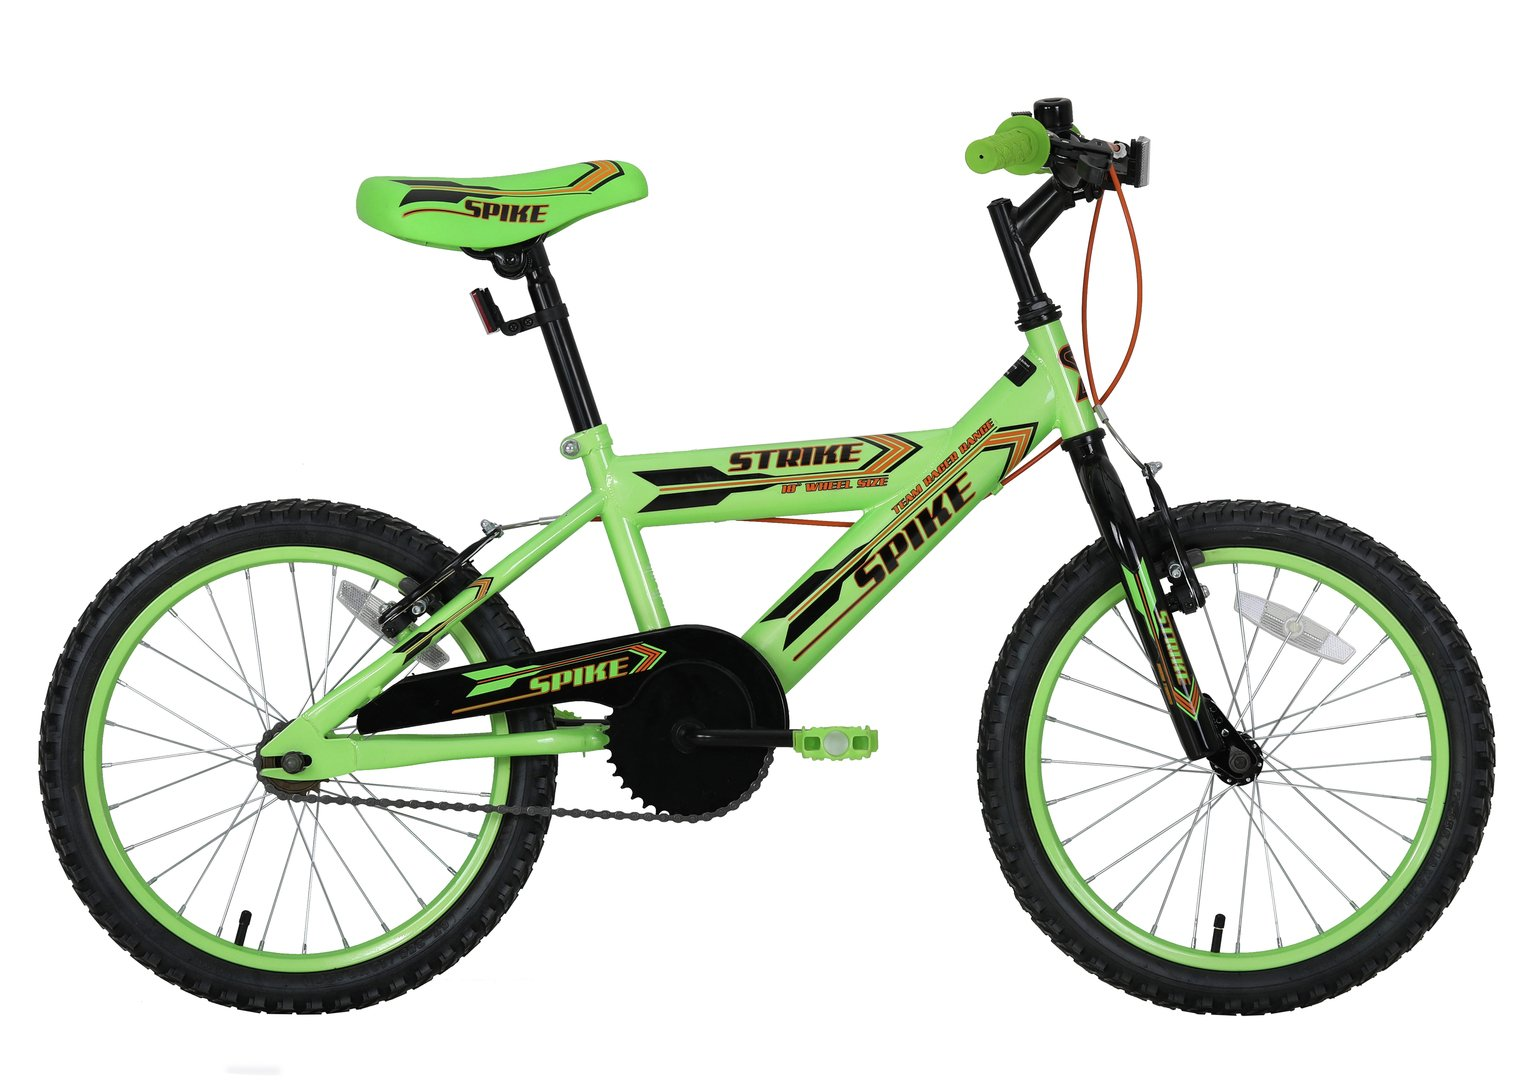 Spike 18 Inch Wheel Size Kids Bike - Green